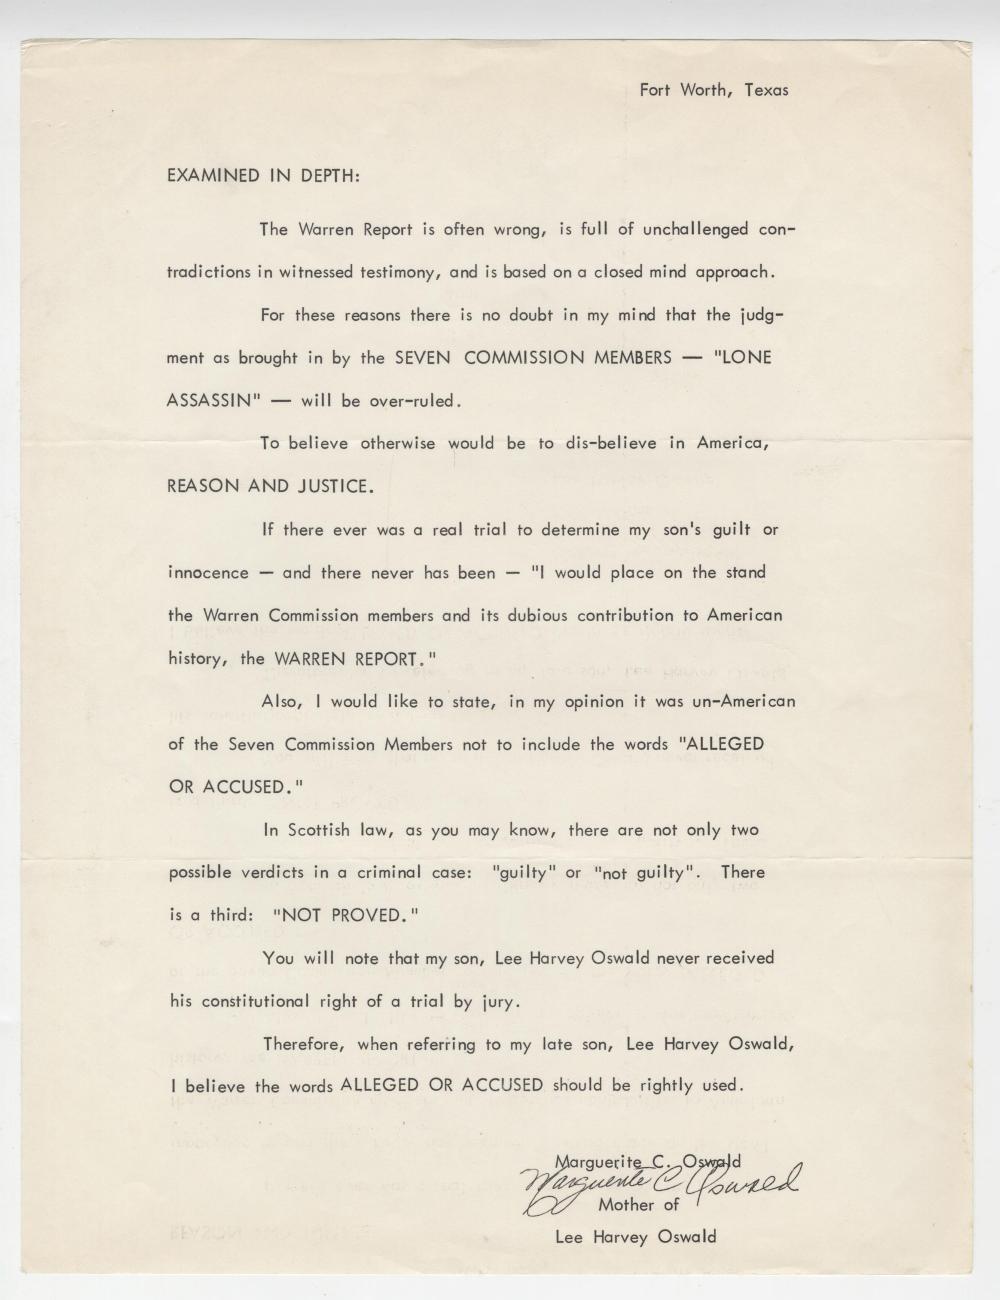 Marguerite Oswald Signed Statement on Assassination